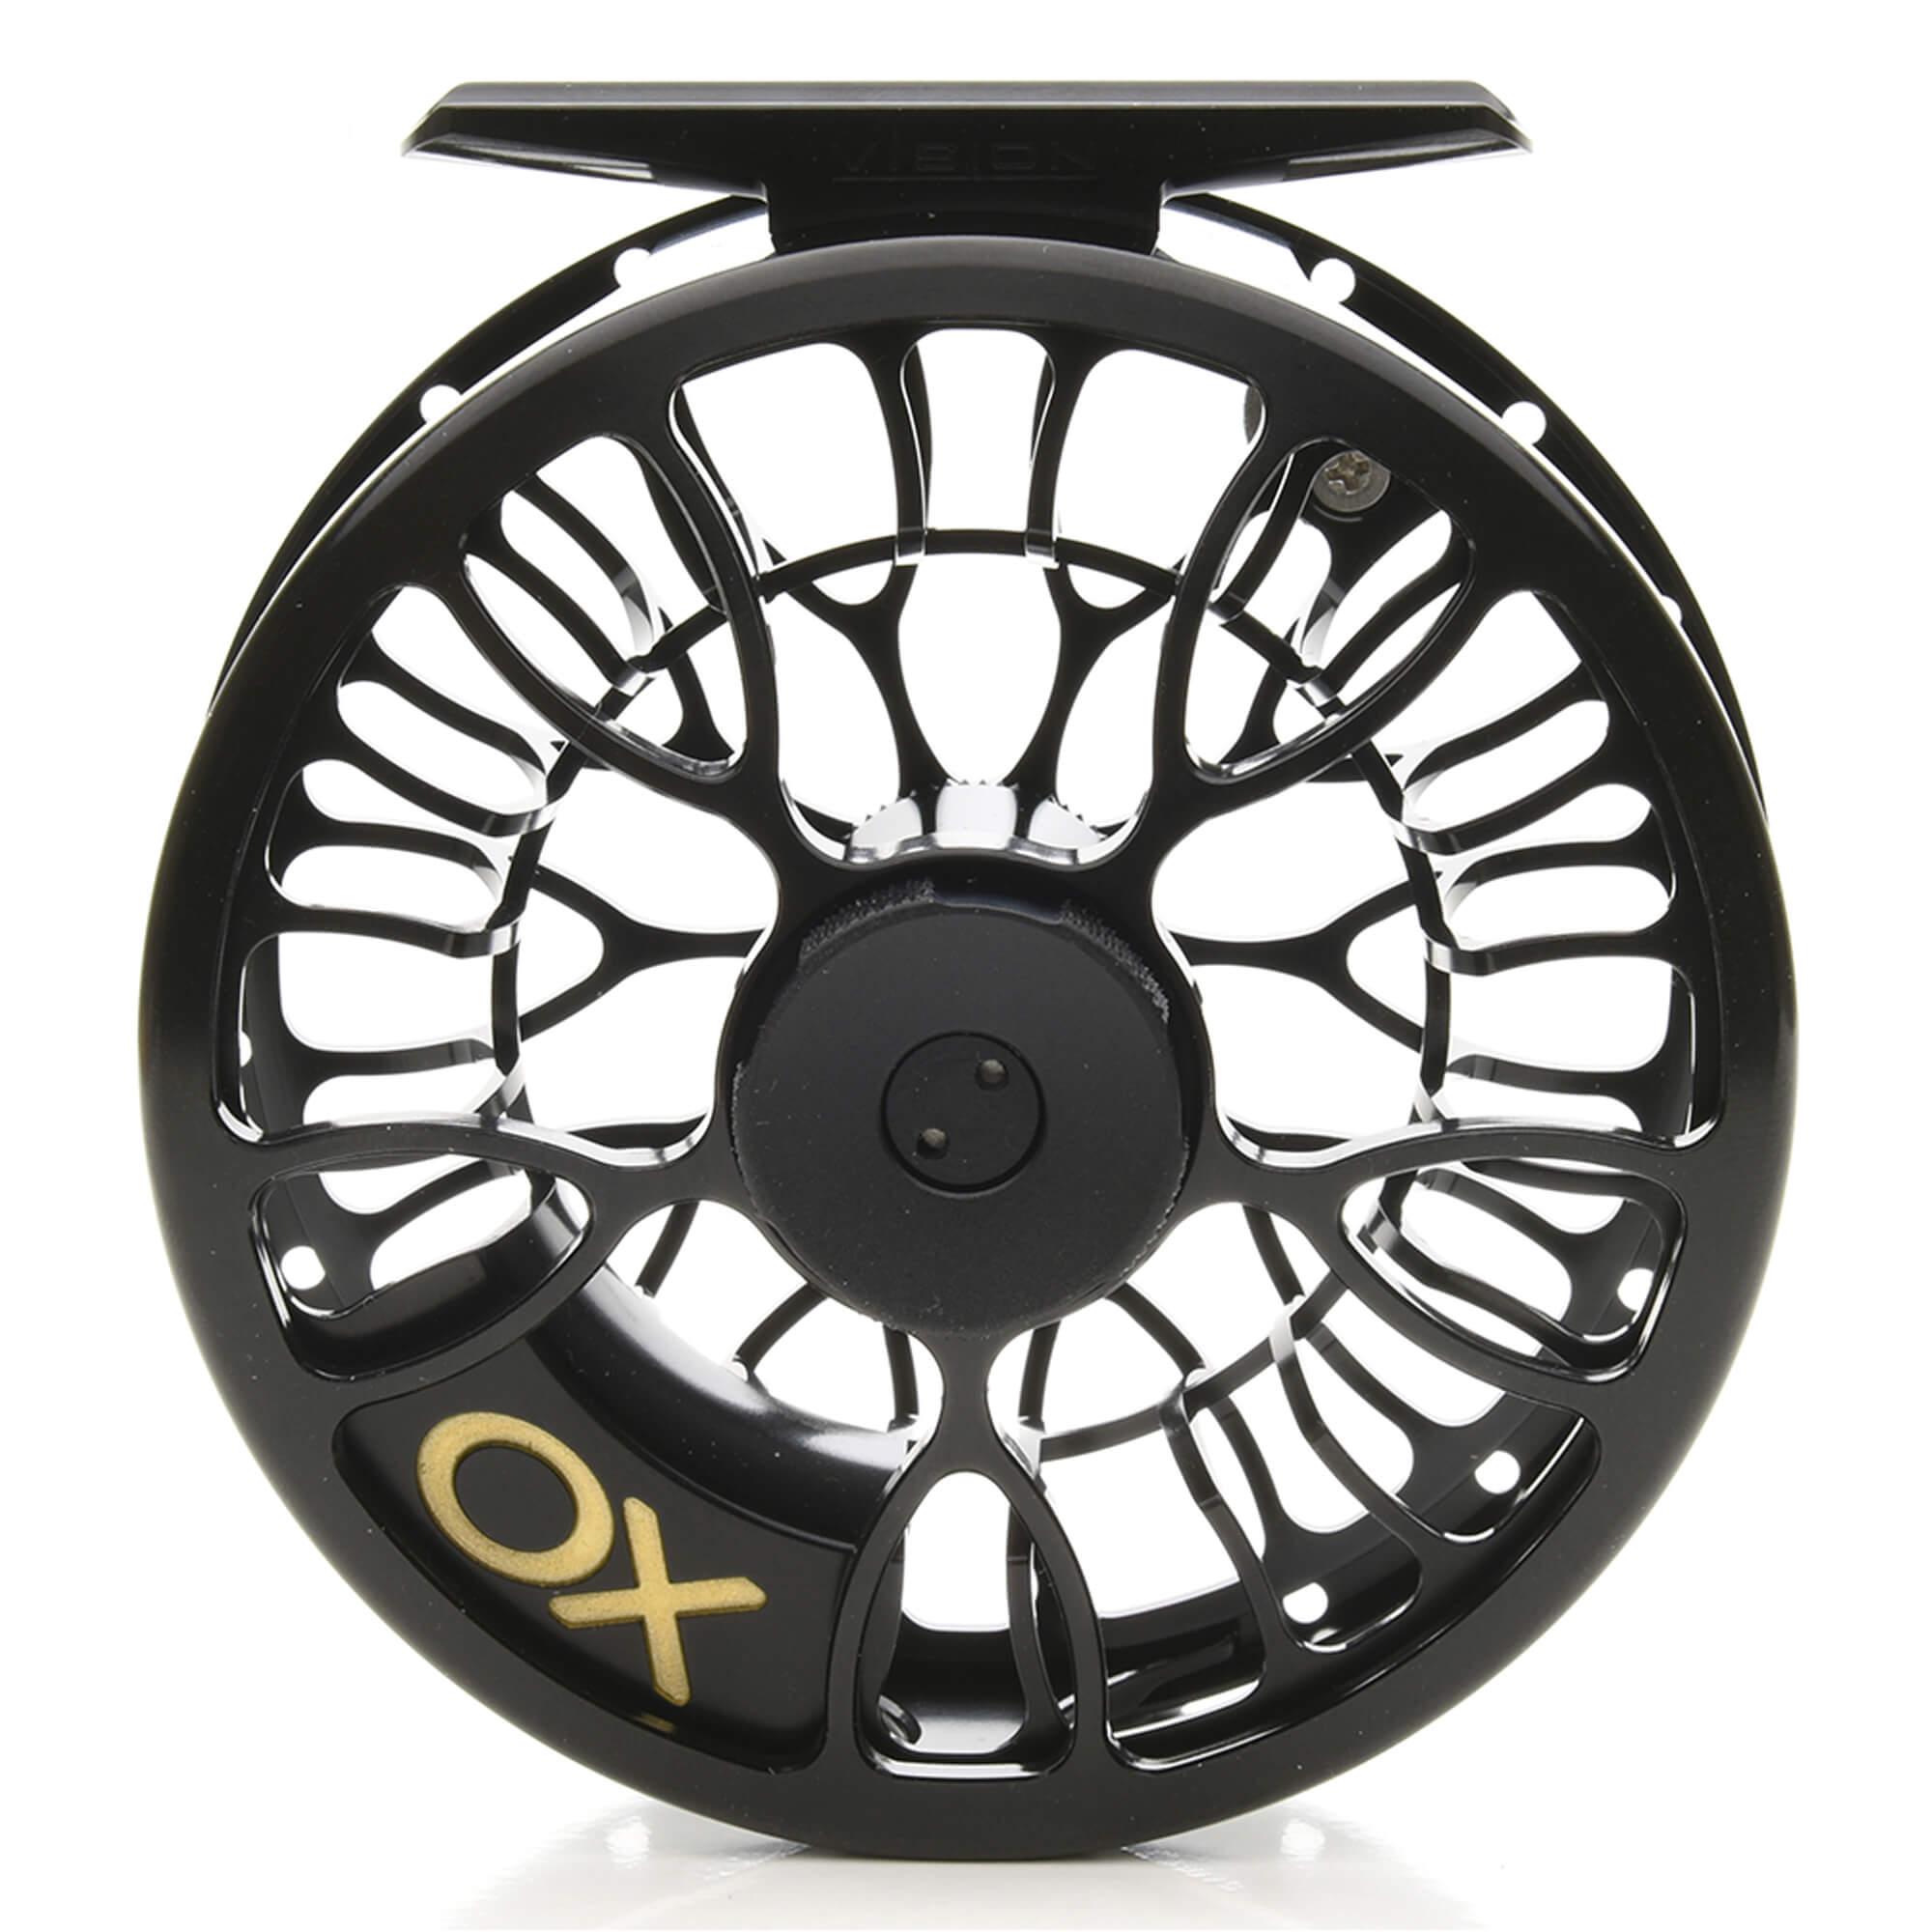 Vision XO Black Fly Reel